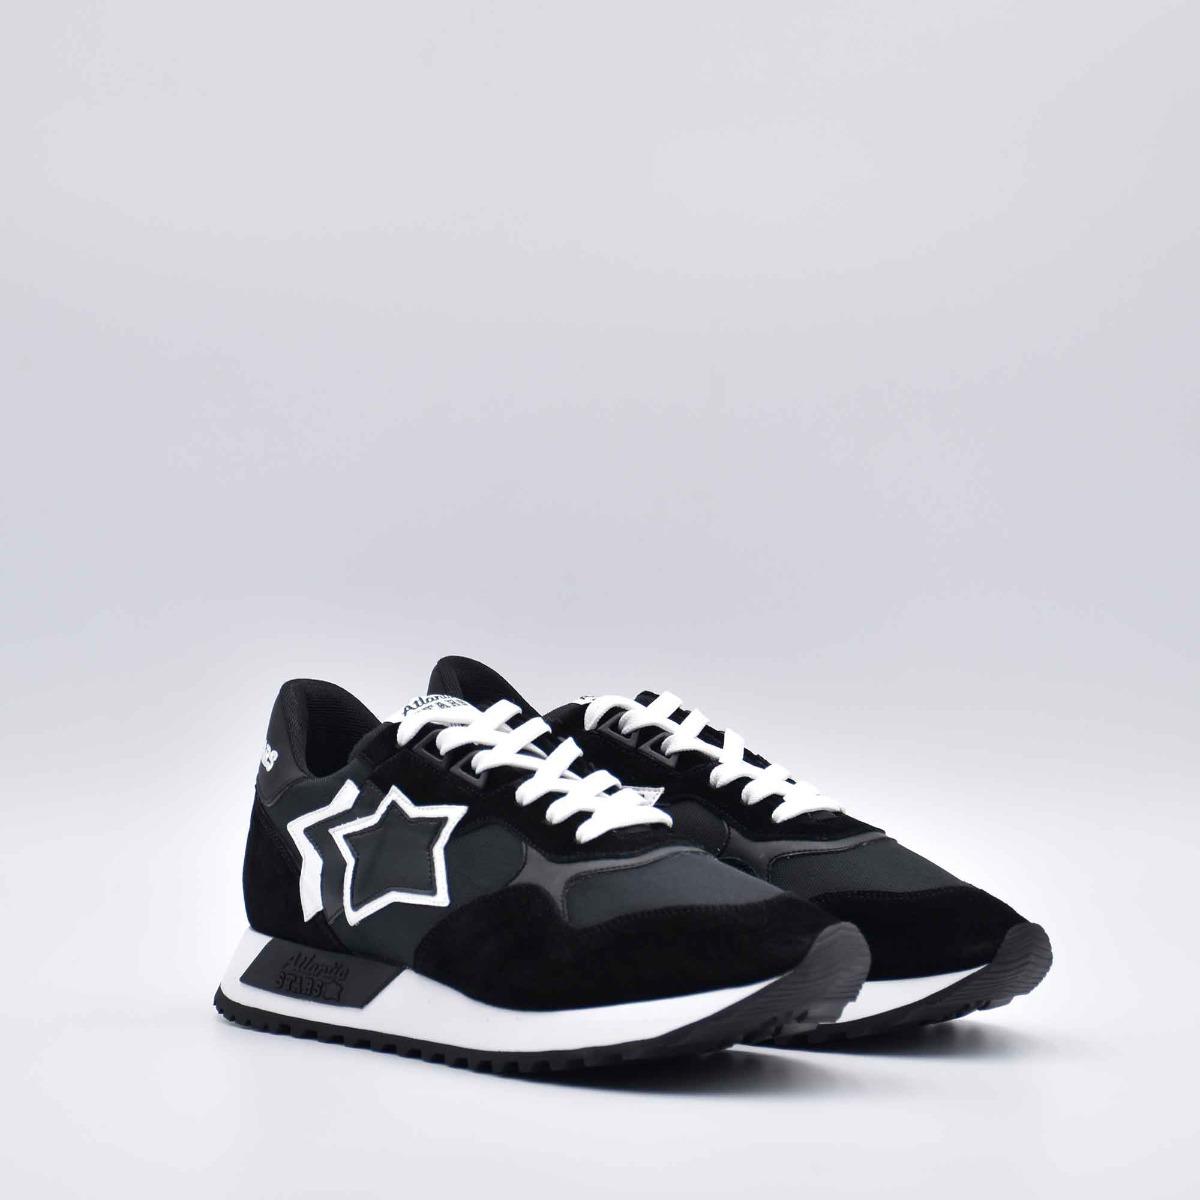 Sneaker draco dr01 - Nero